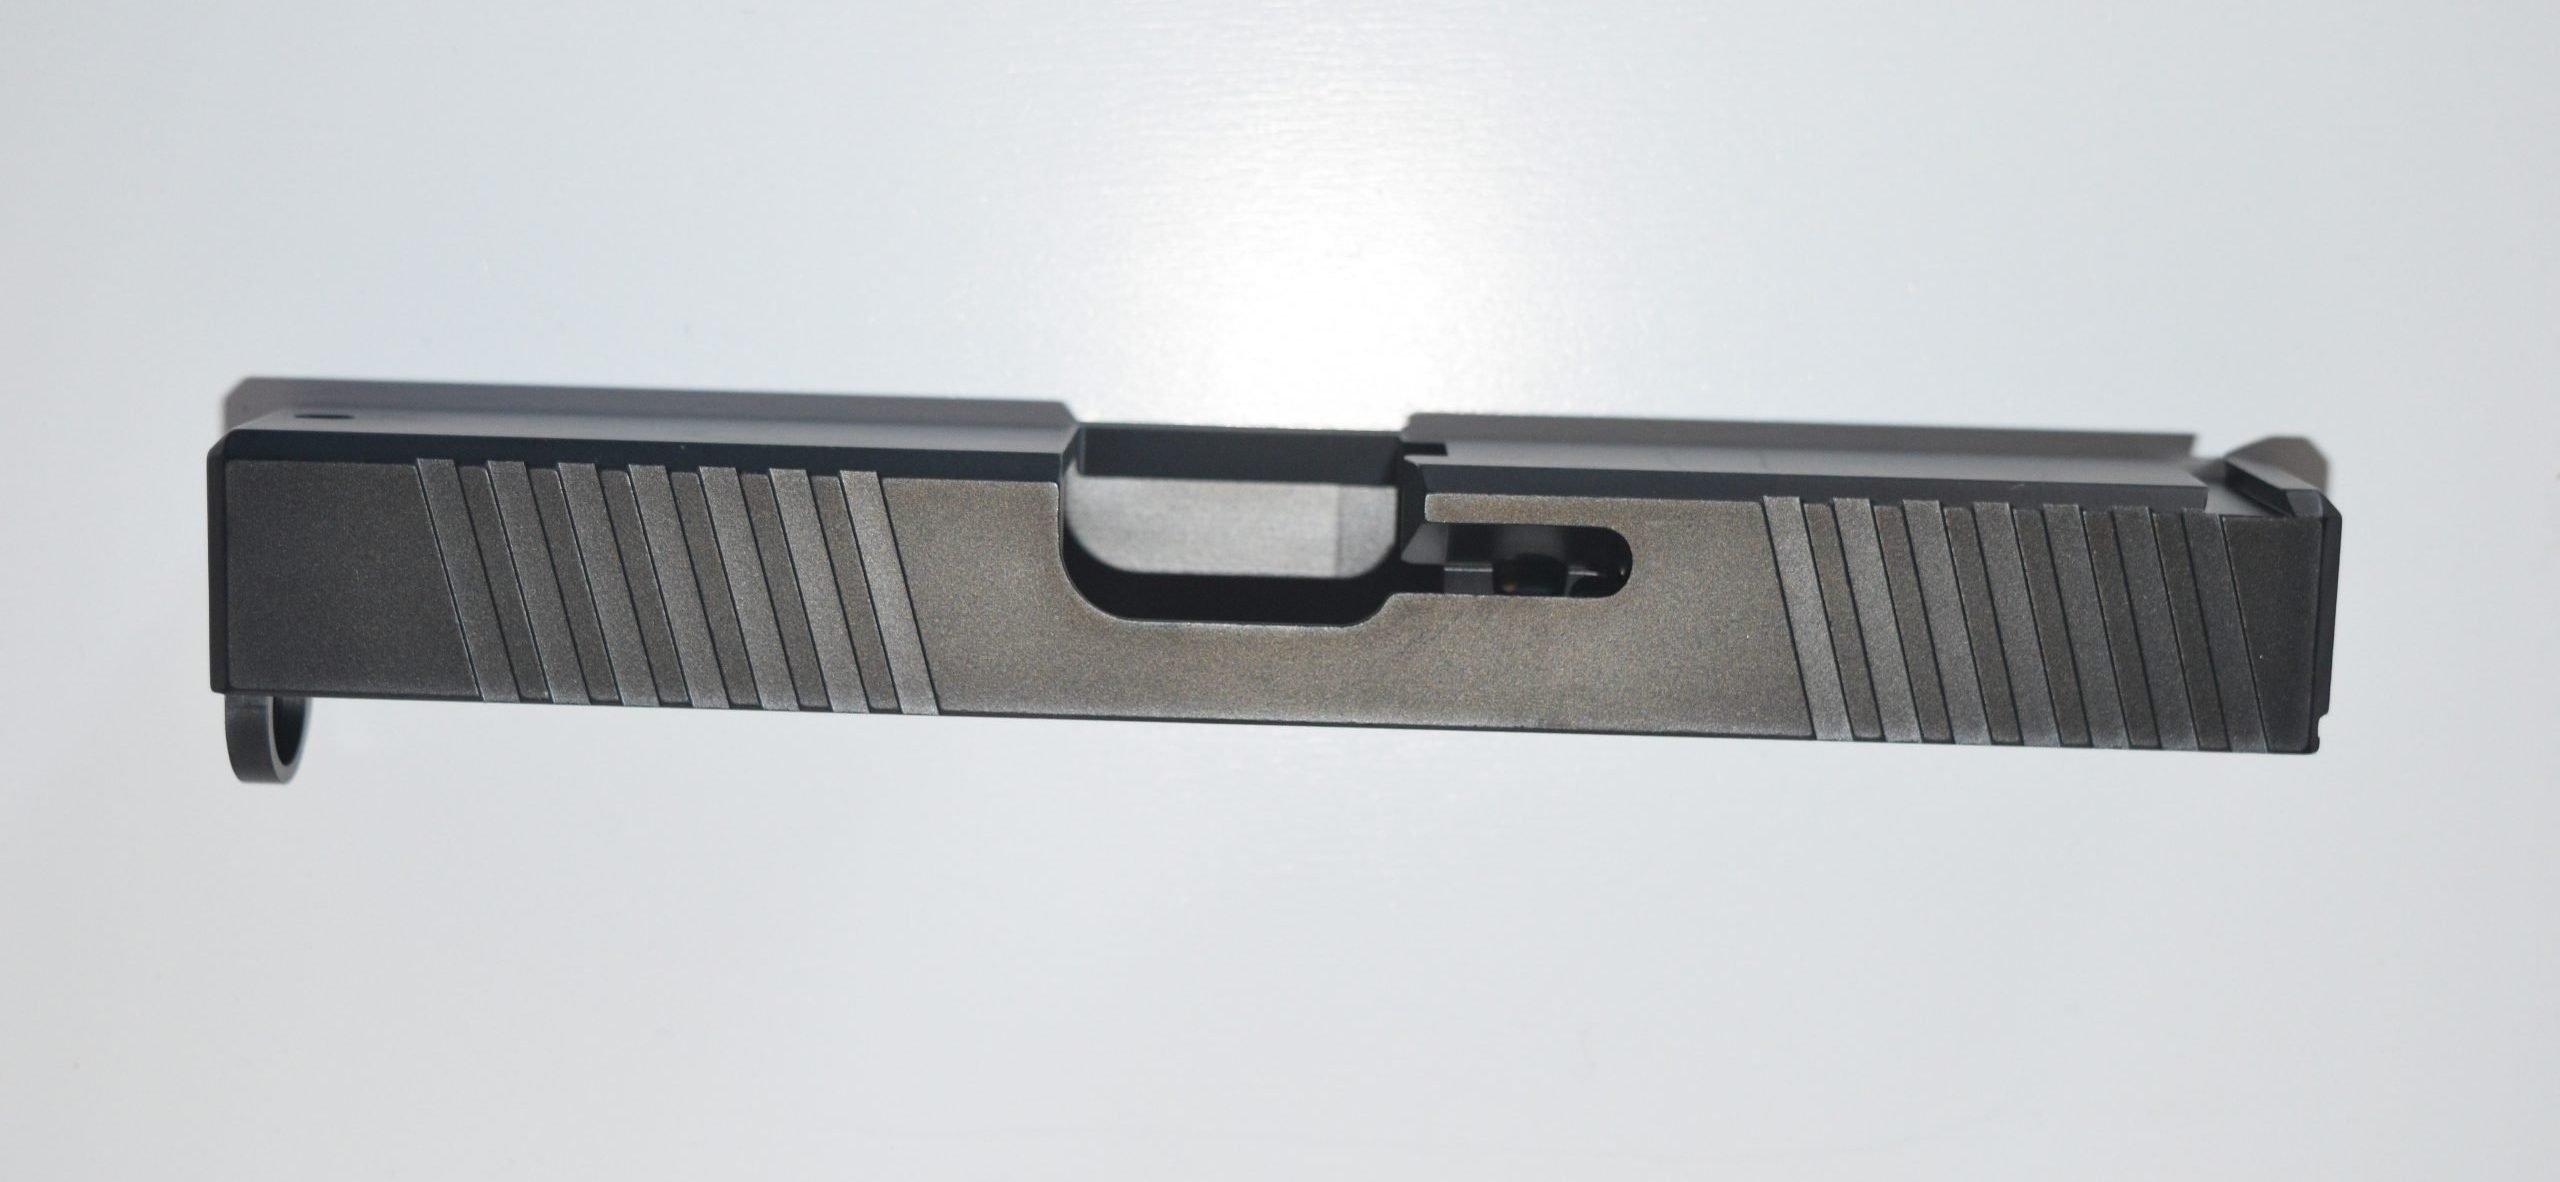 Glock 19 DLC Standard Slide